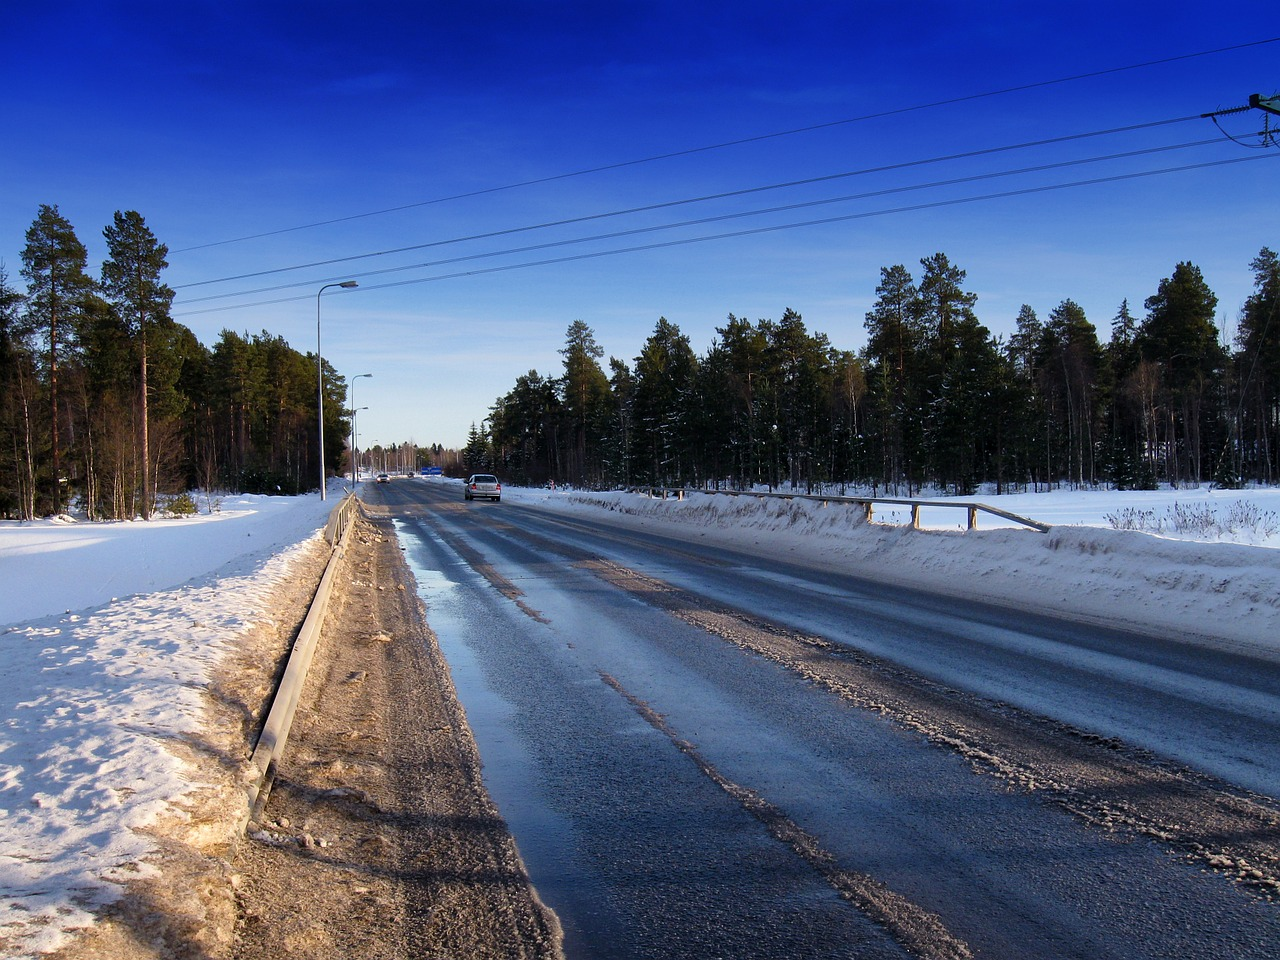 finland-110130_1280